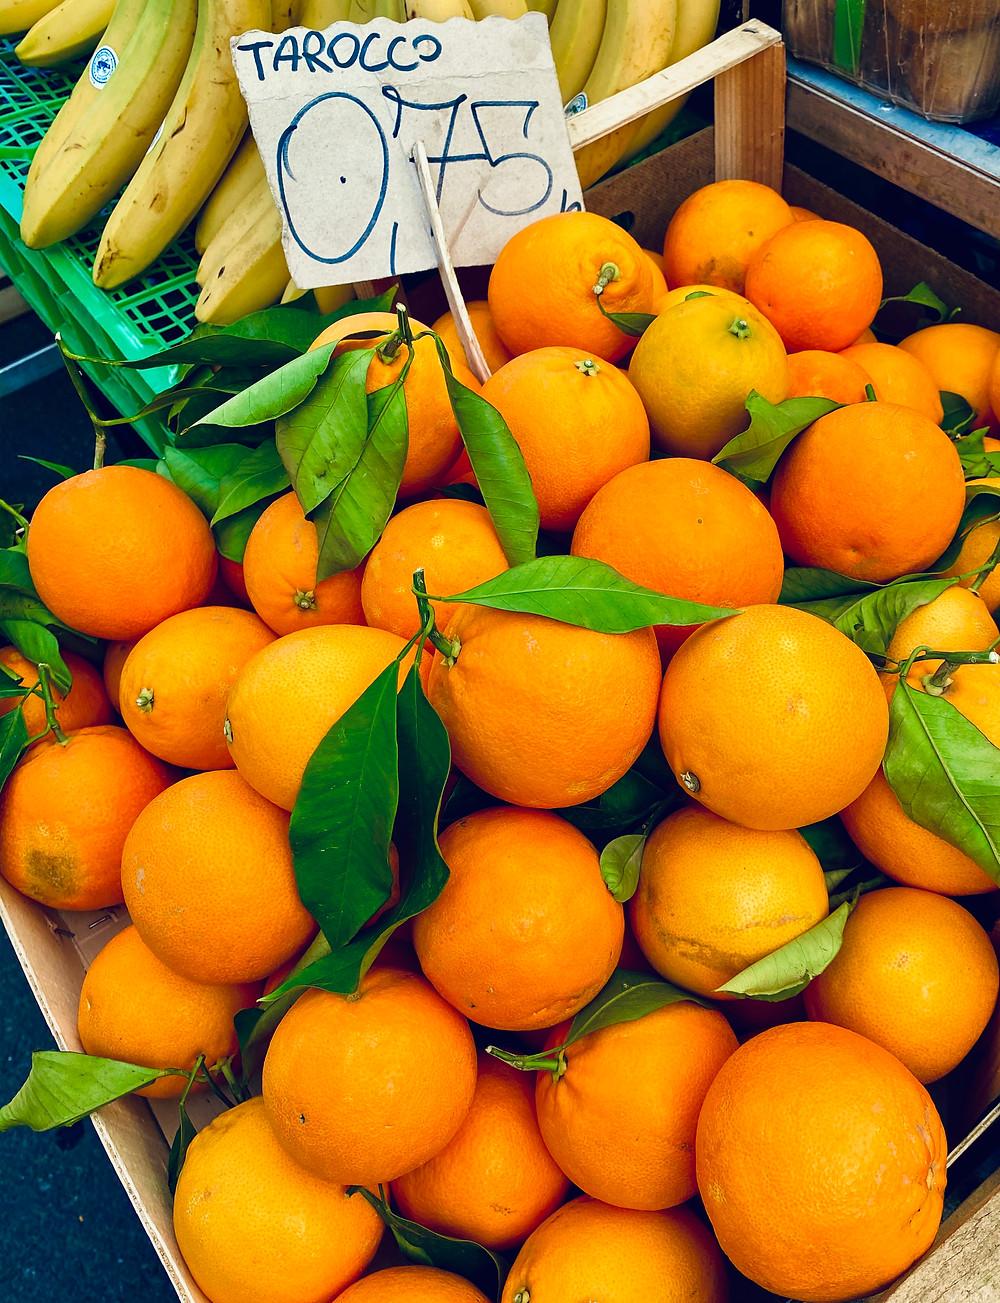 sicily-blood-oranges-tarocco